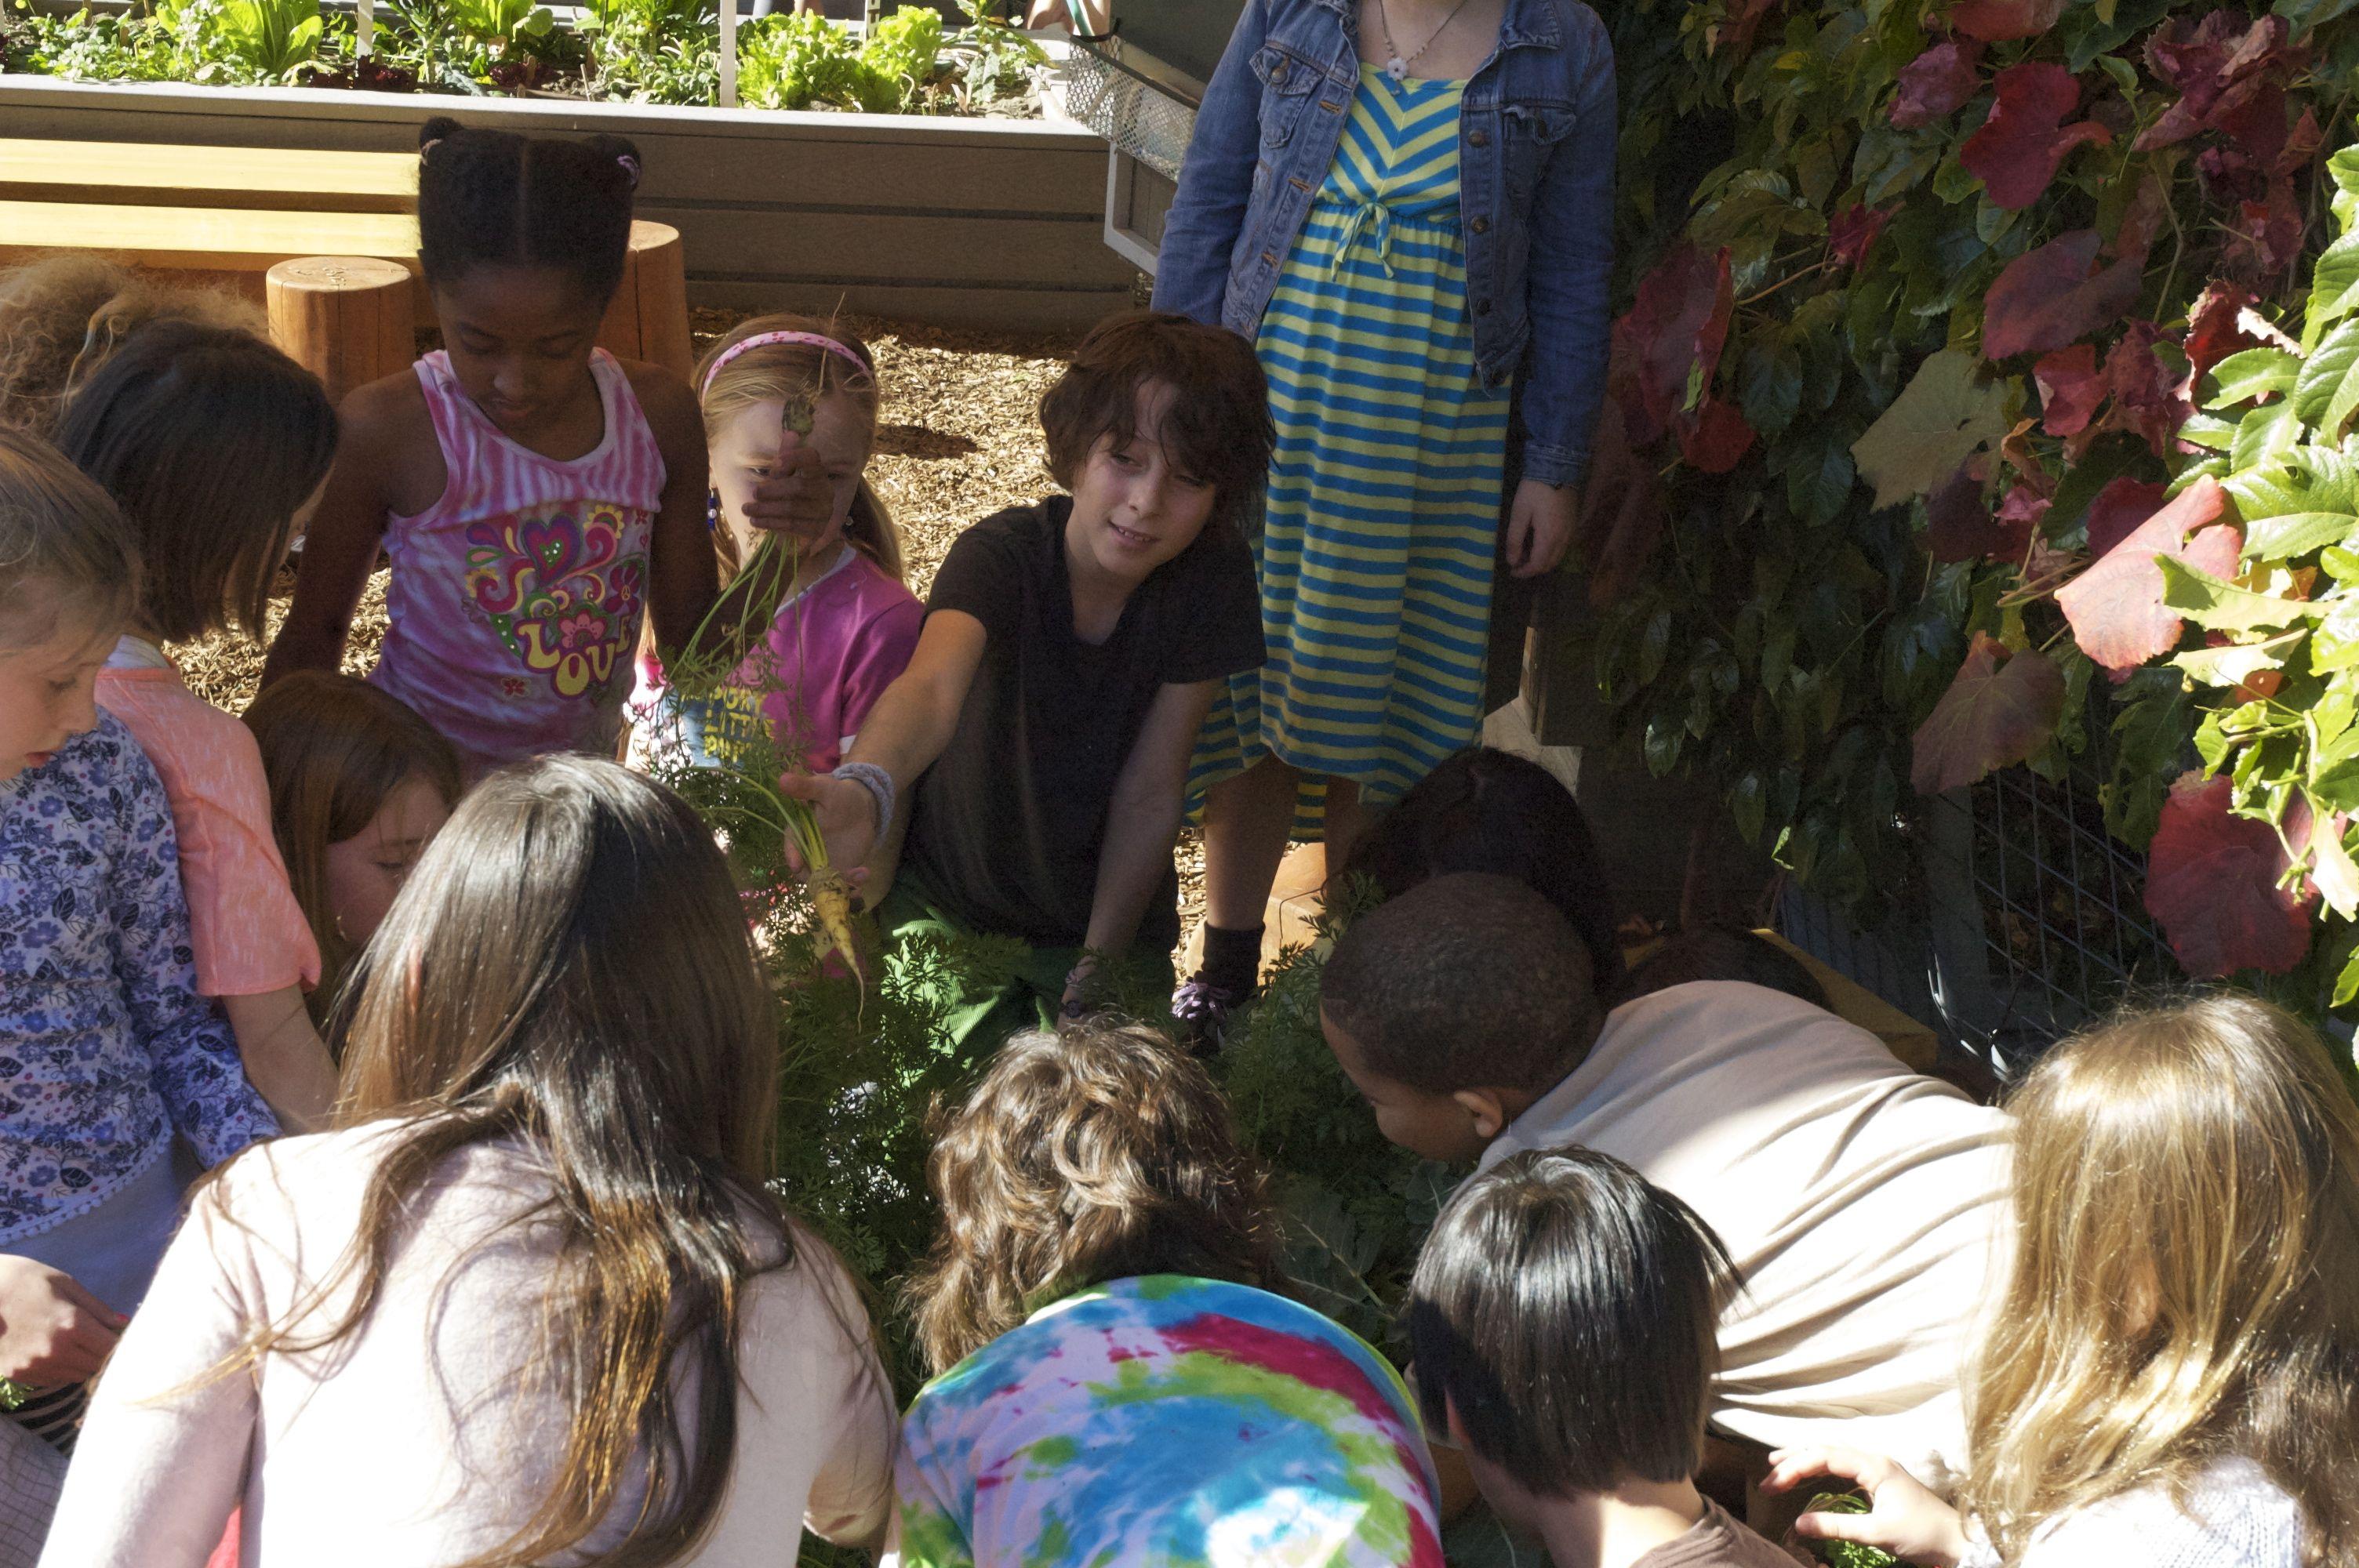 Kids harvesting carrots